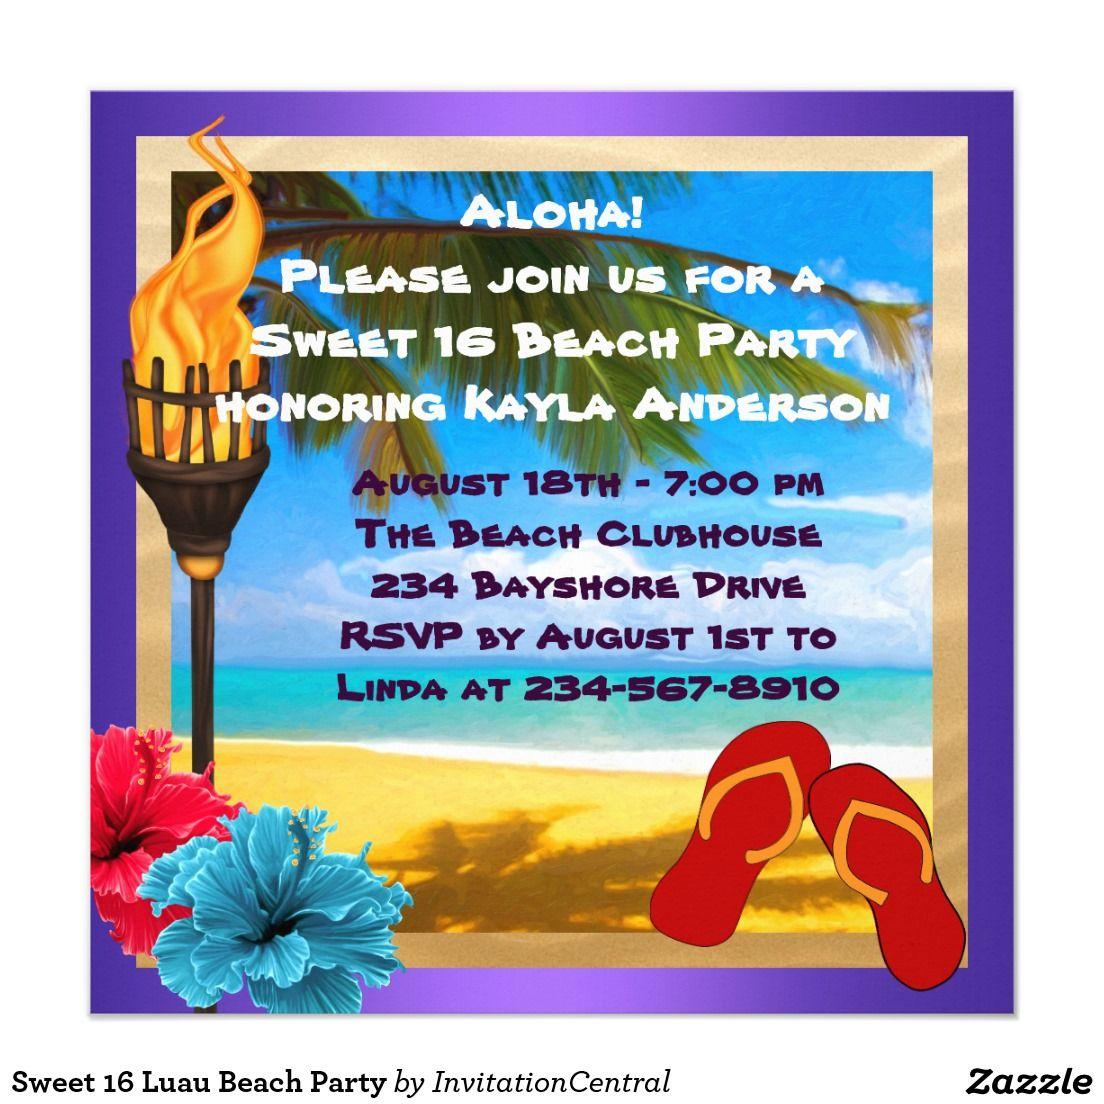 Sweet 16 Luau Beach Party Card | Luau, Sweet 16 and Caribbean party